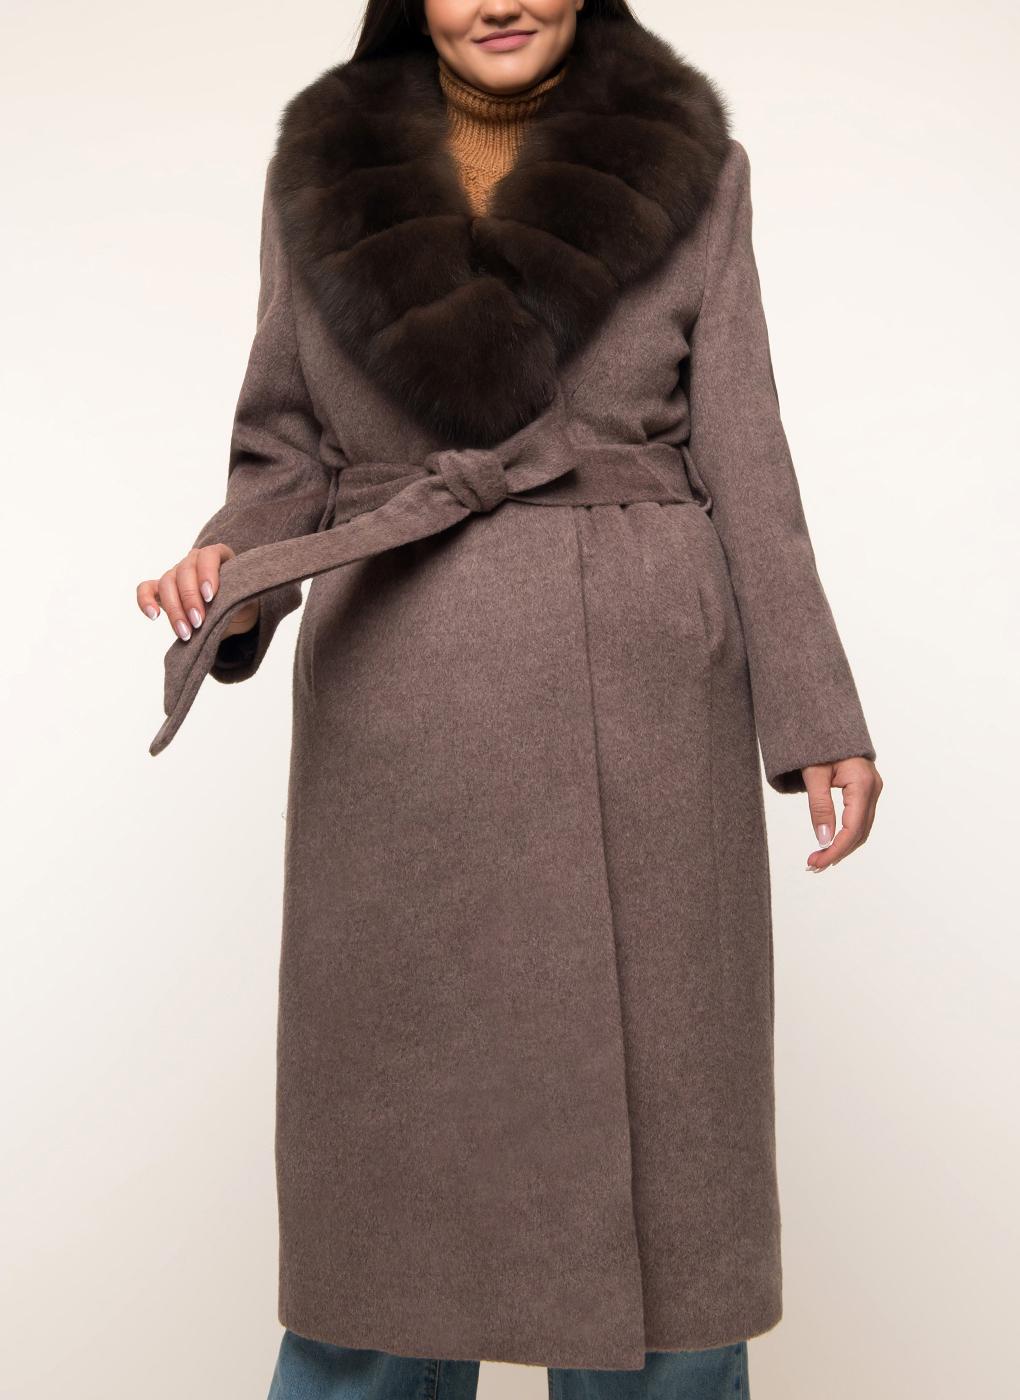 Пальто шерстяное 97, idekka фото